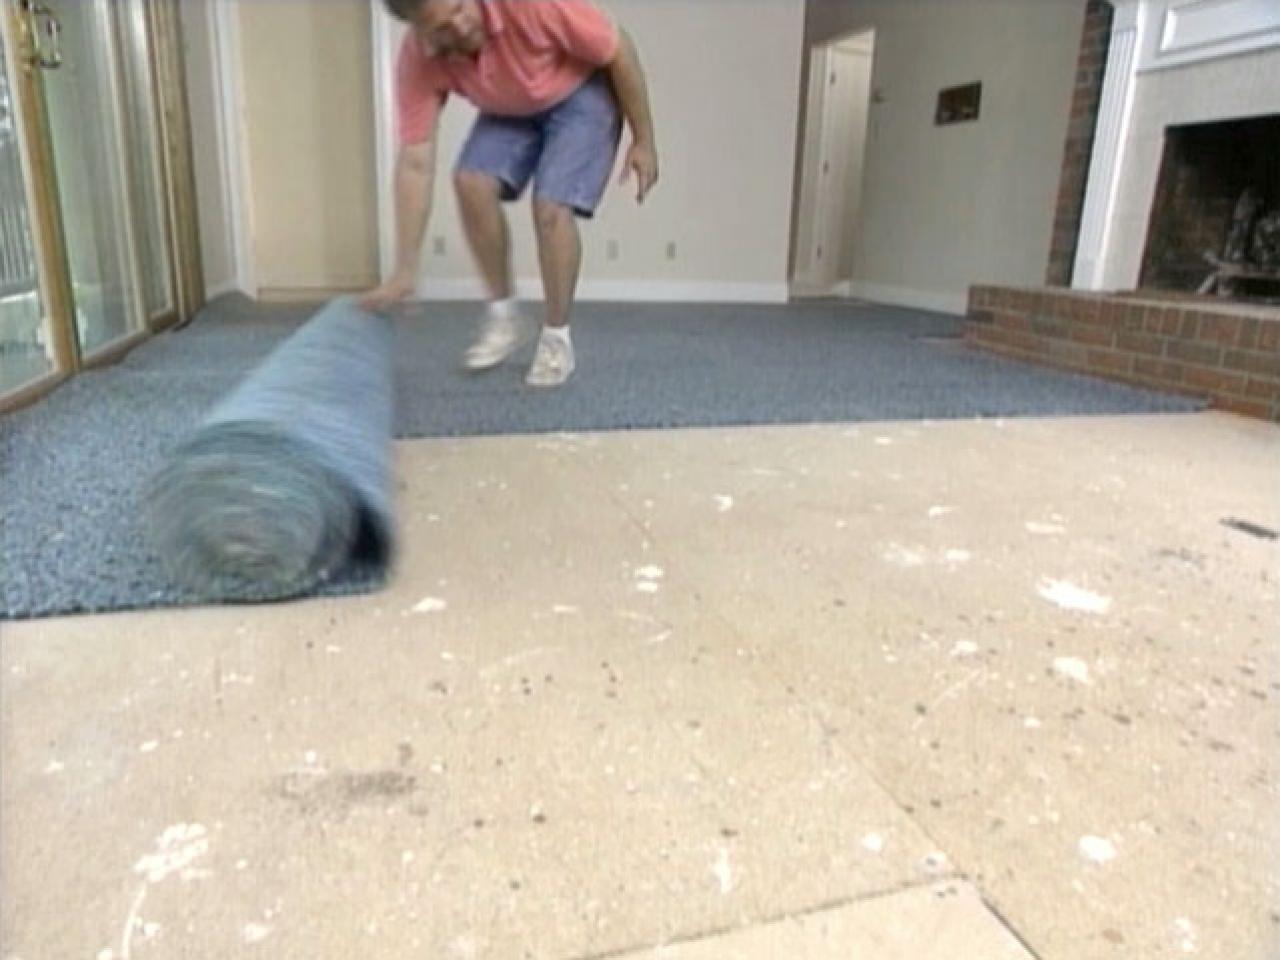 How To Install Carpet Tile On Concrete Floor Flooring Ideas In 2020 Carpet Installation Diy Carpet Basement Carpet